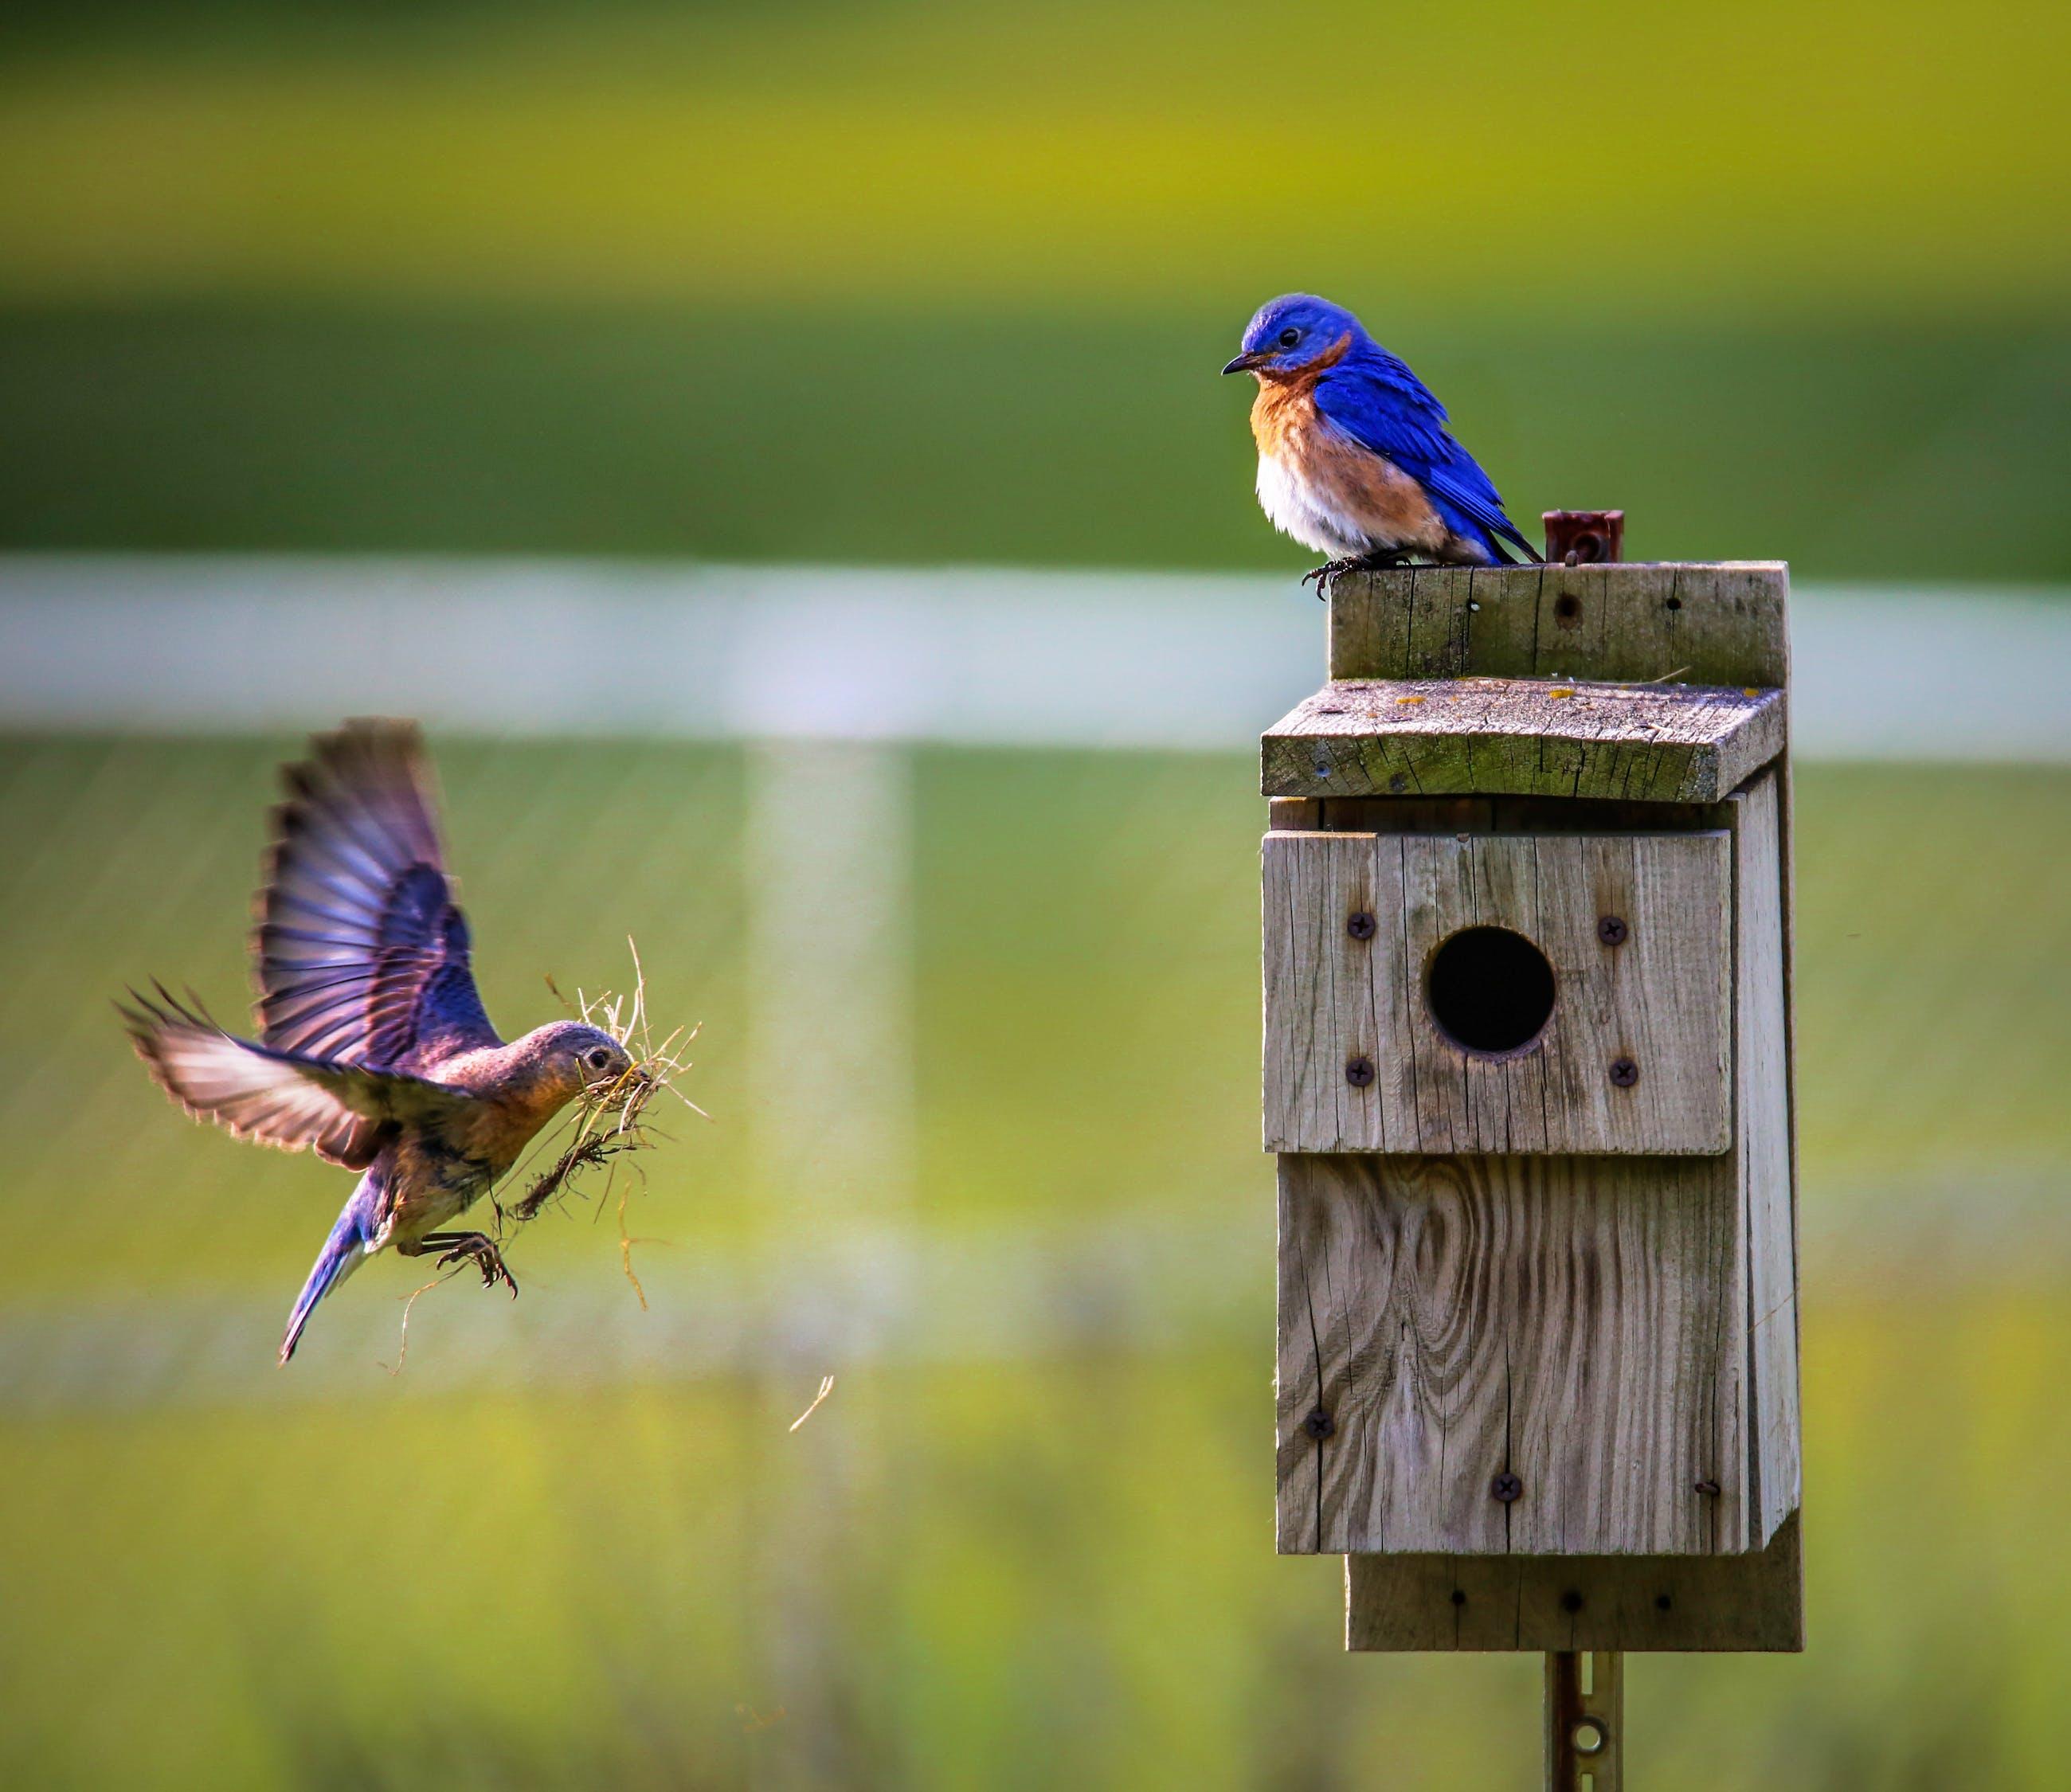 two birds near wooden birdhouse